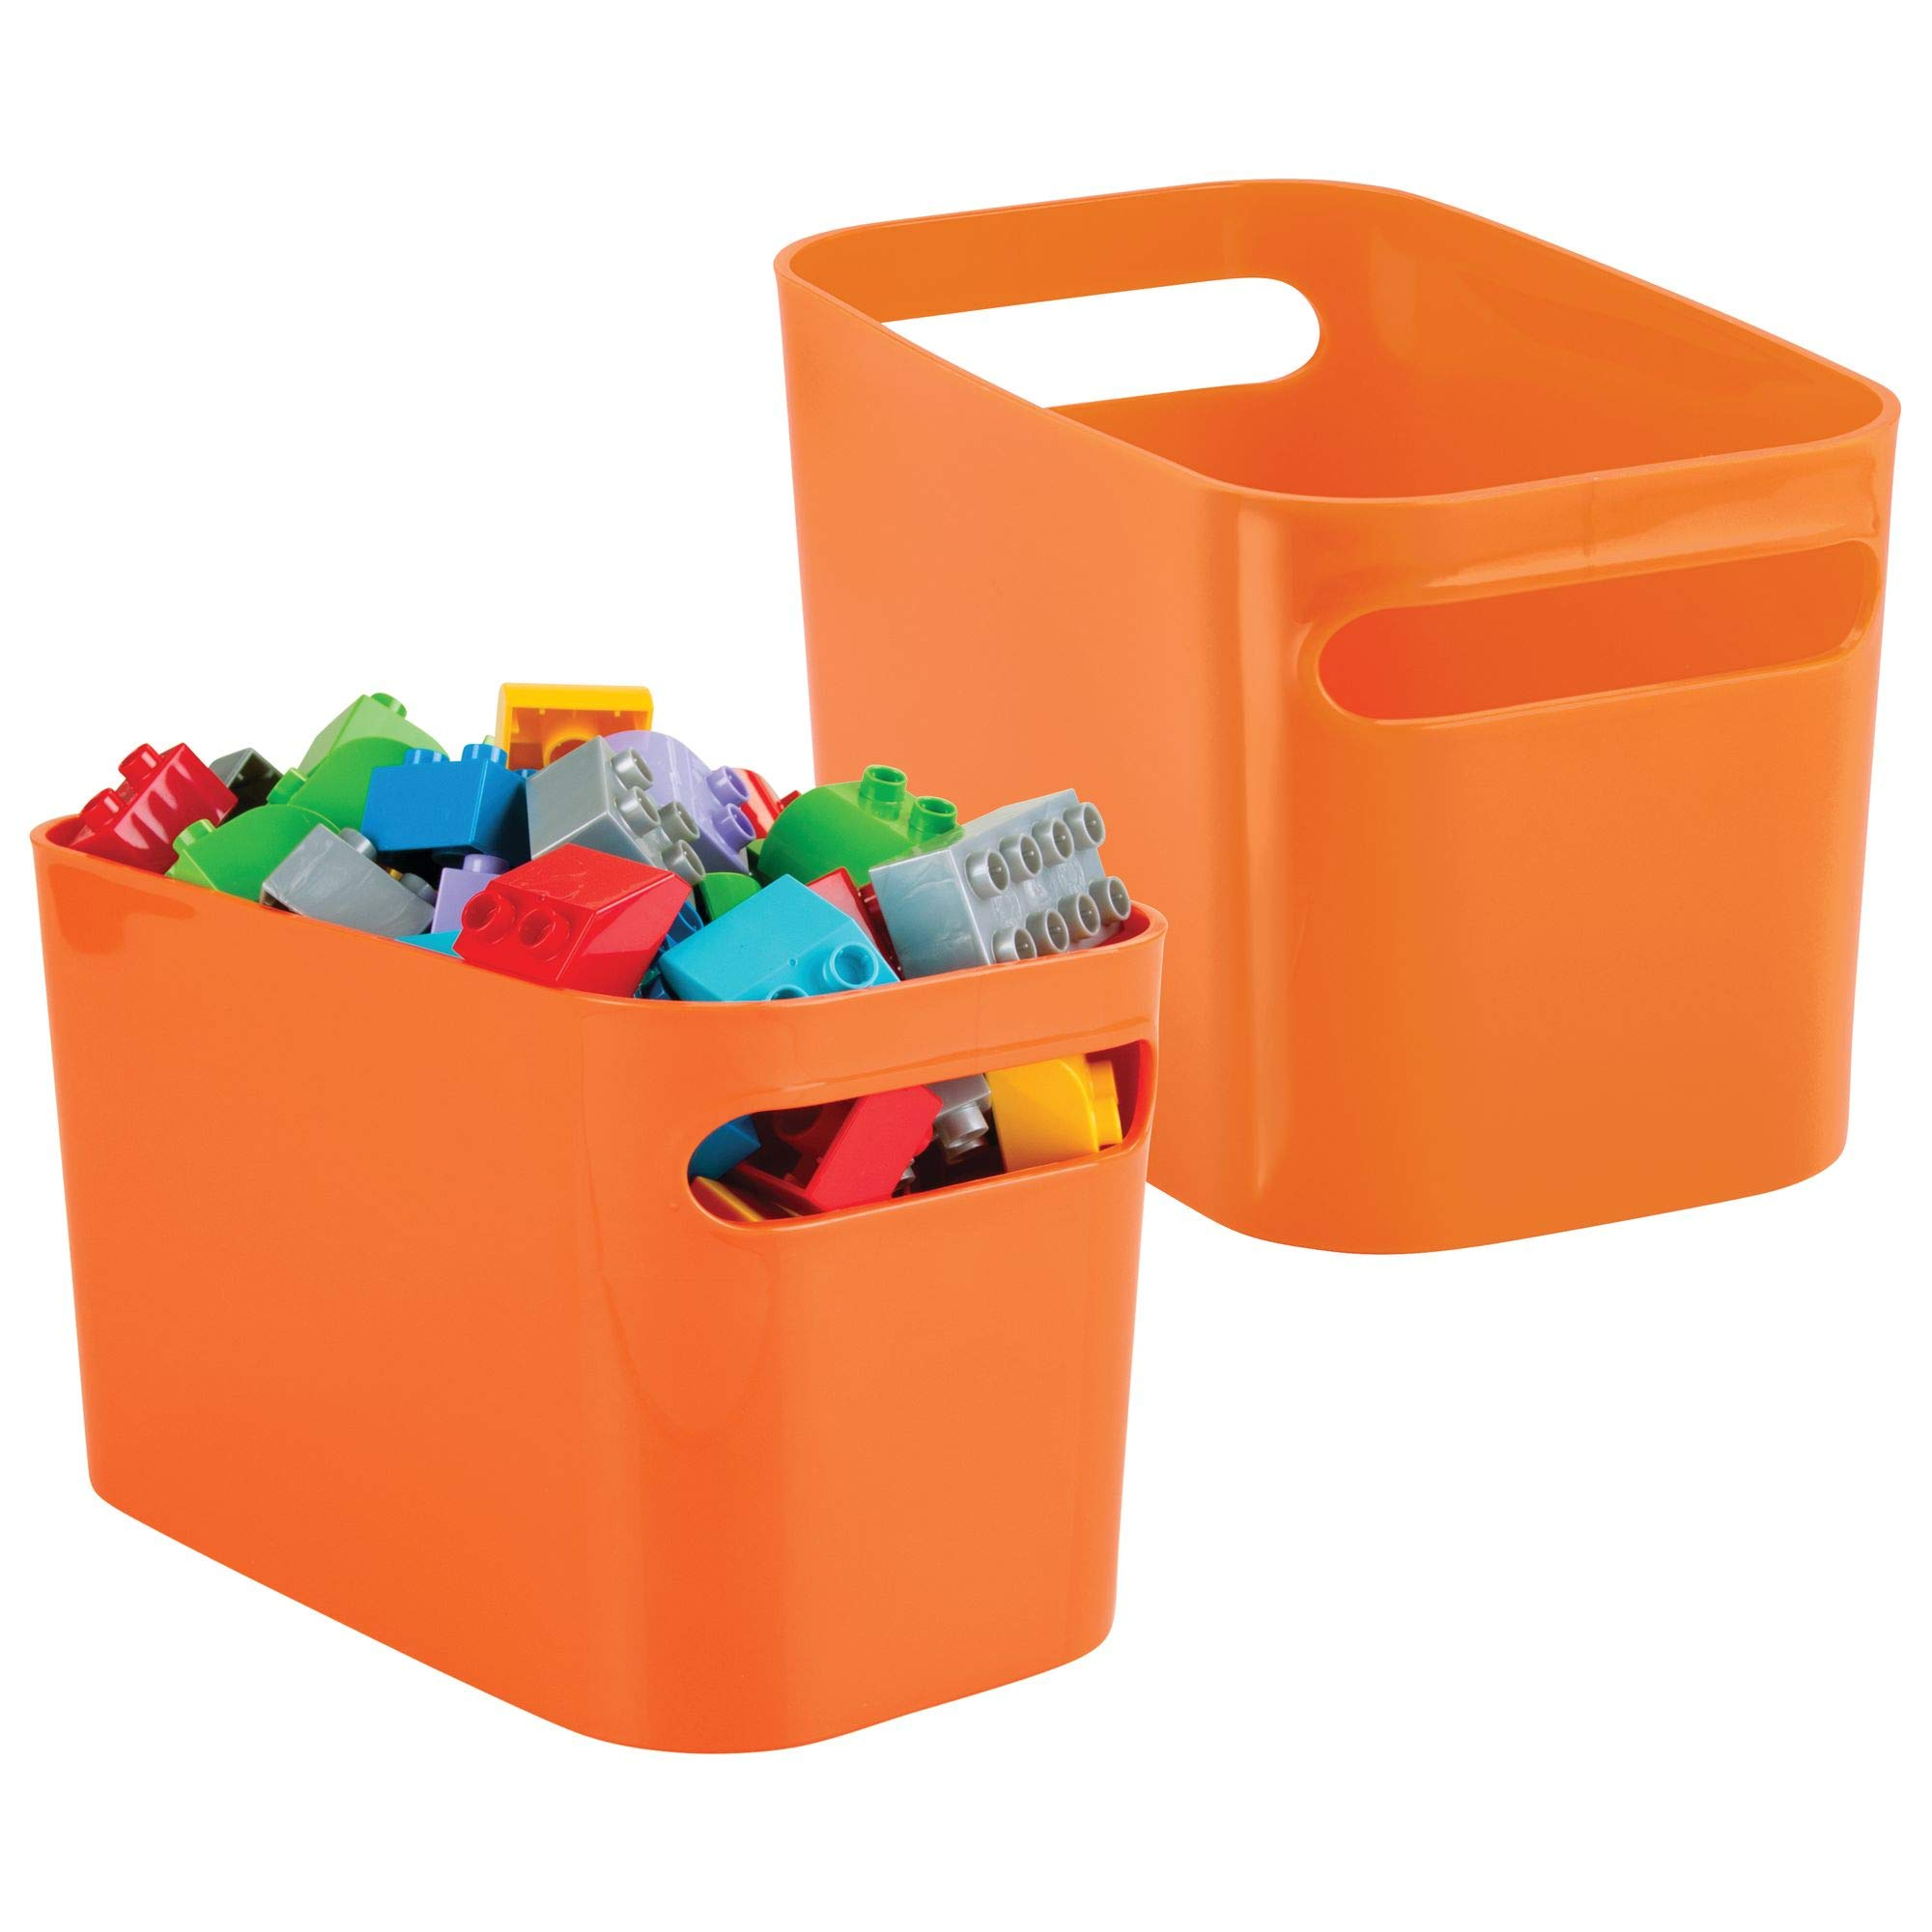 mDesign Kids/Baby Toy Storage Bin for Dolls, Modeling Clay, Blocks, Cars - Pack of 2, Orange